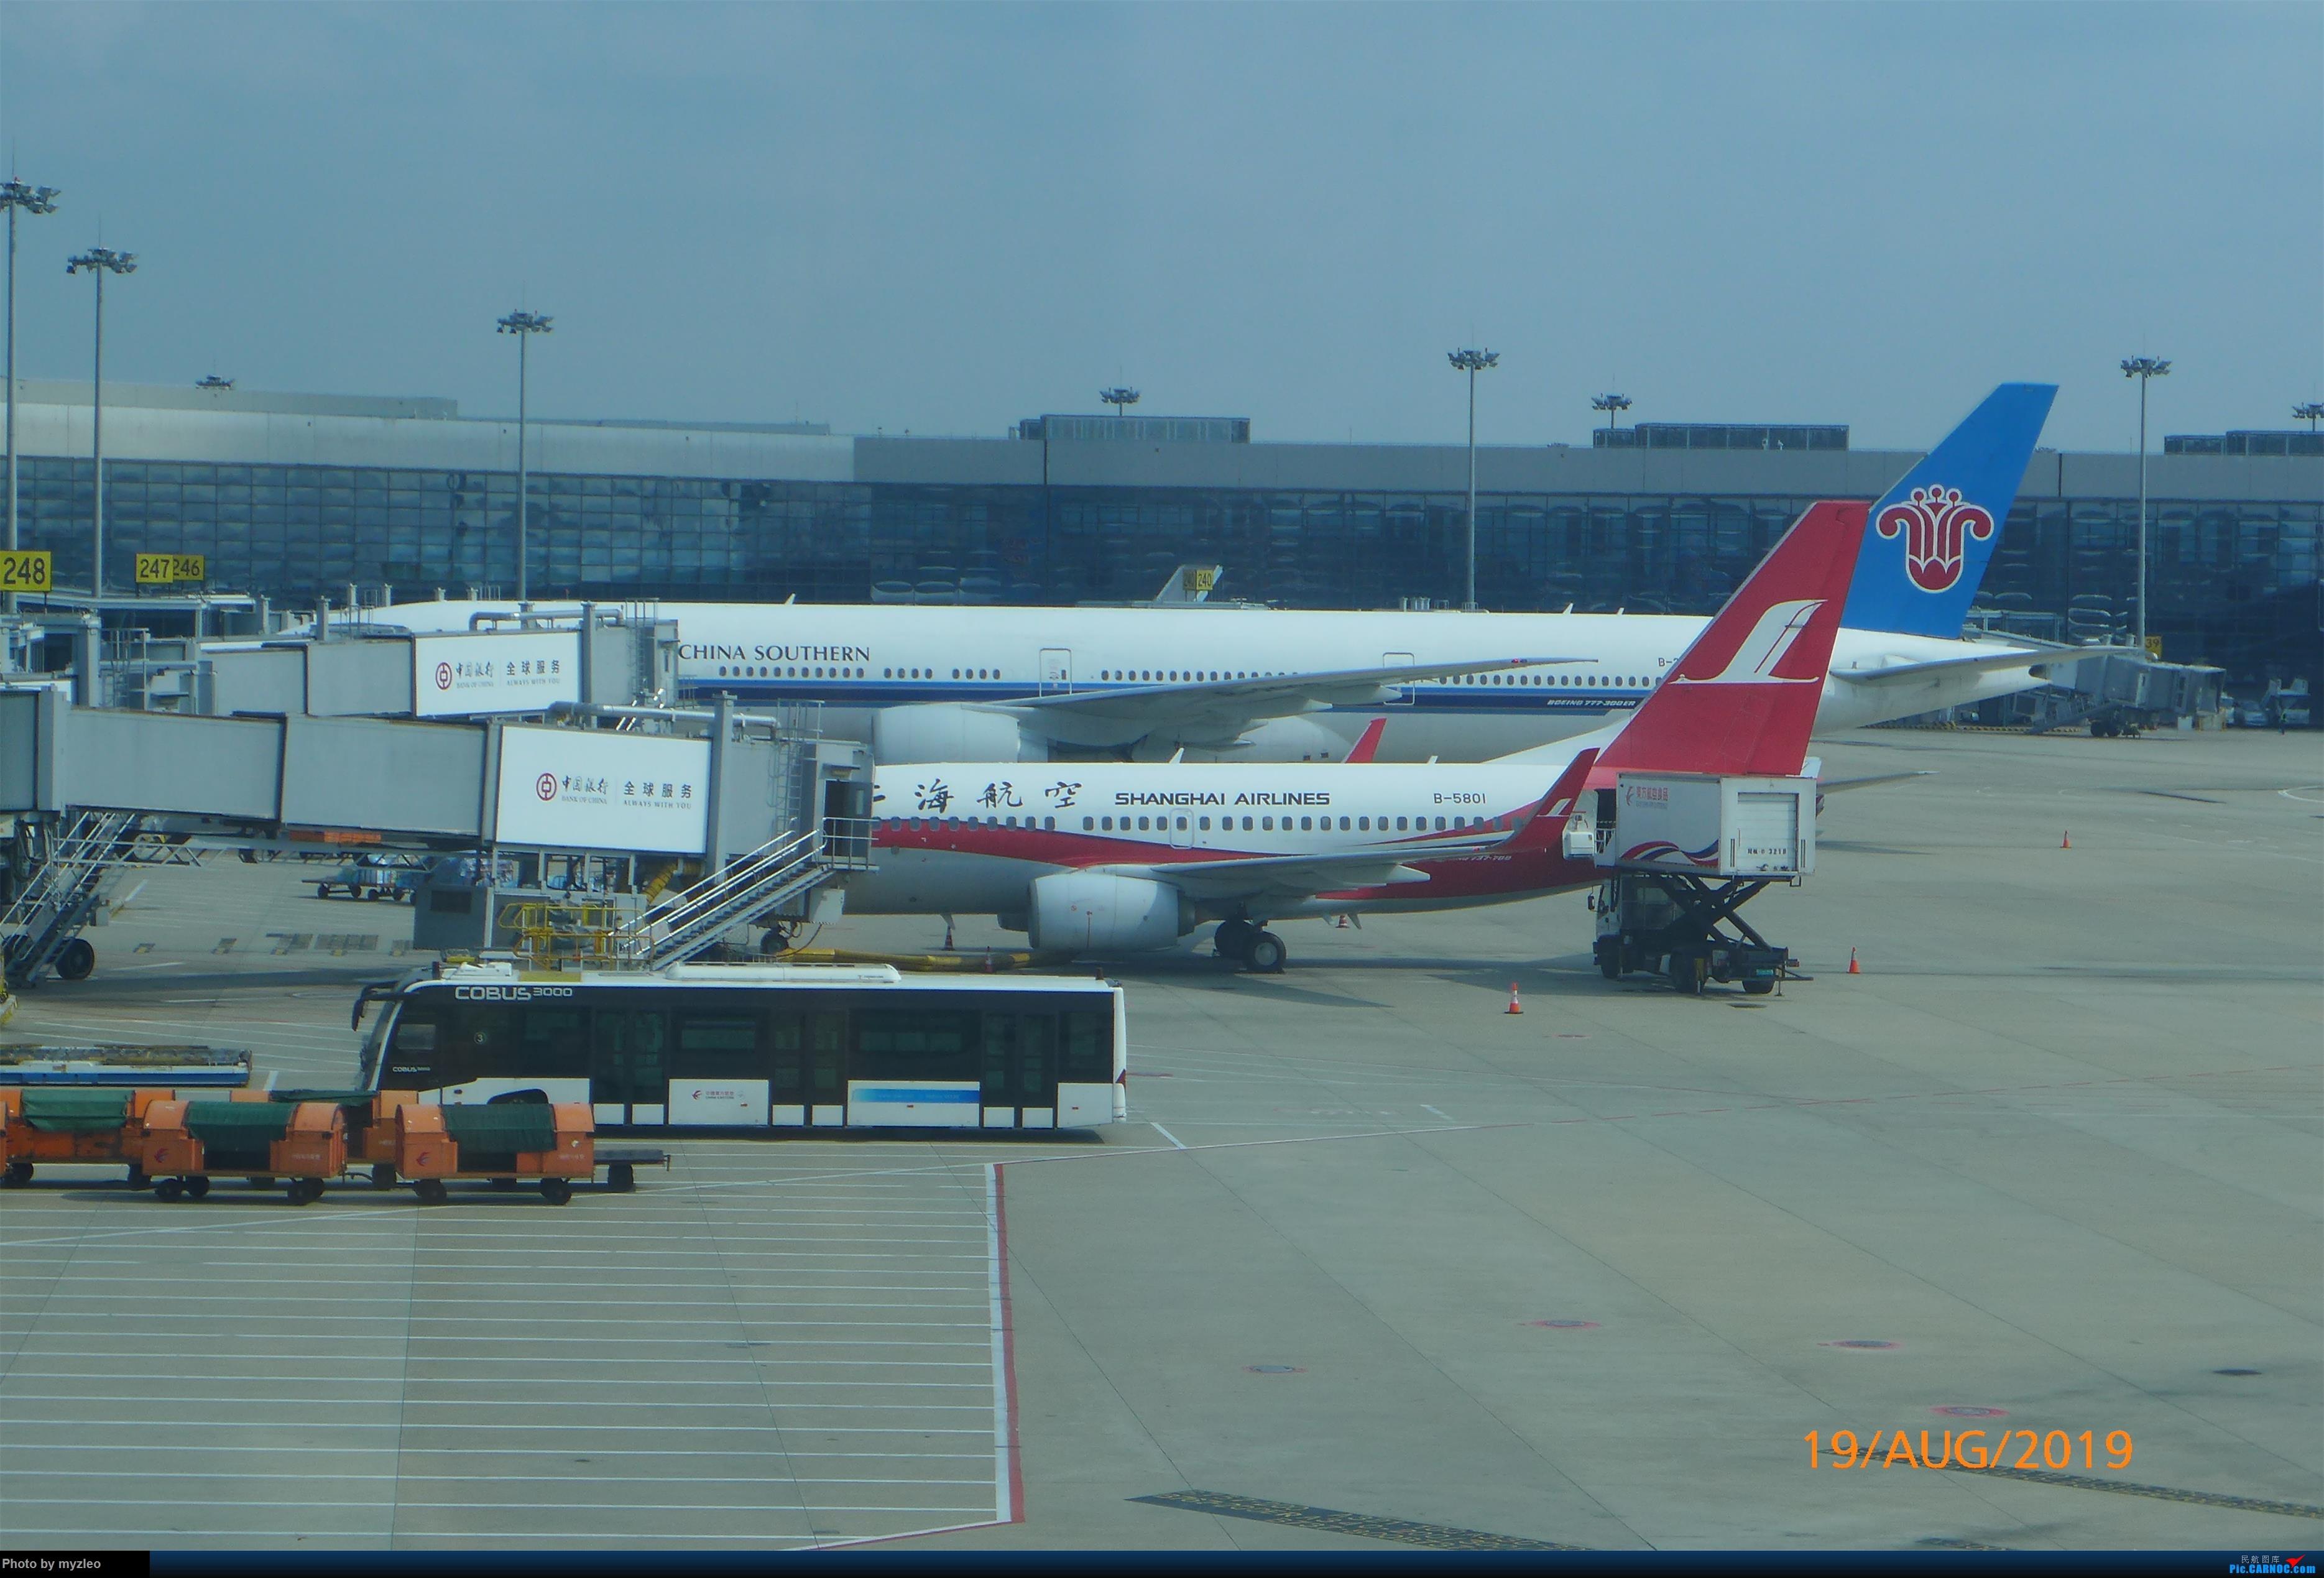 Re:[原创]【myzleo的游记5.1】梦圆一九(1)首搭国航359,北京城里到处走 BOEING 737-700 B-5801 中国上海虹桥国际机场